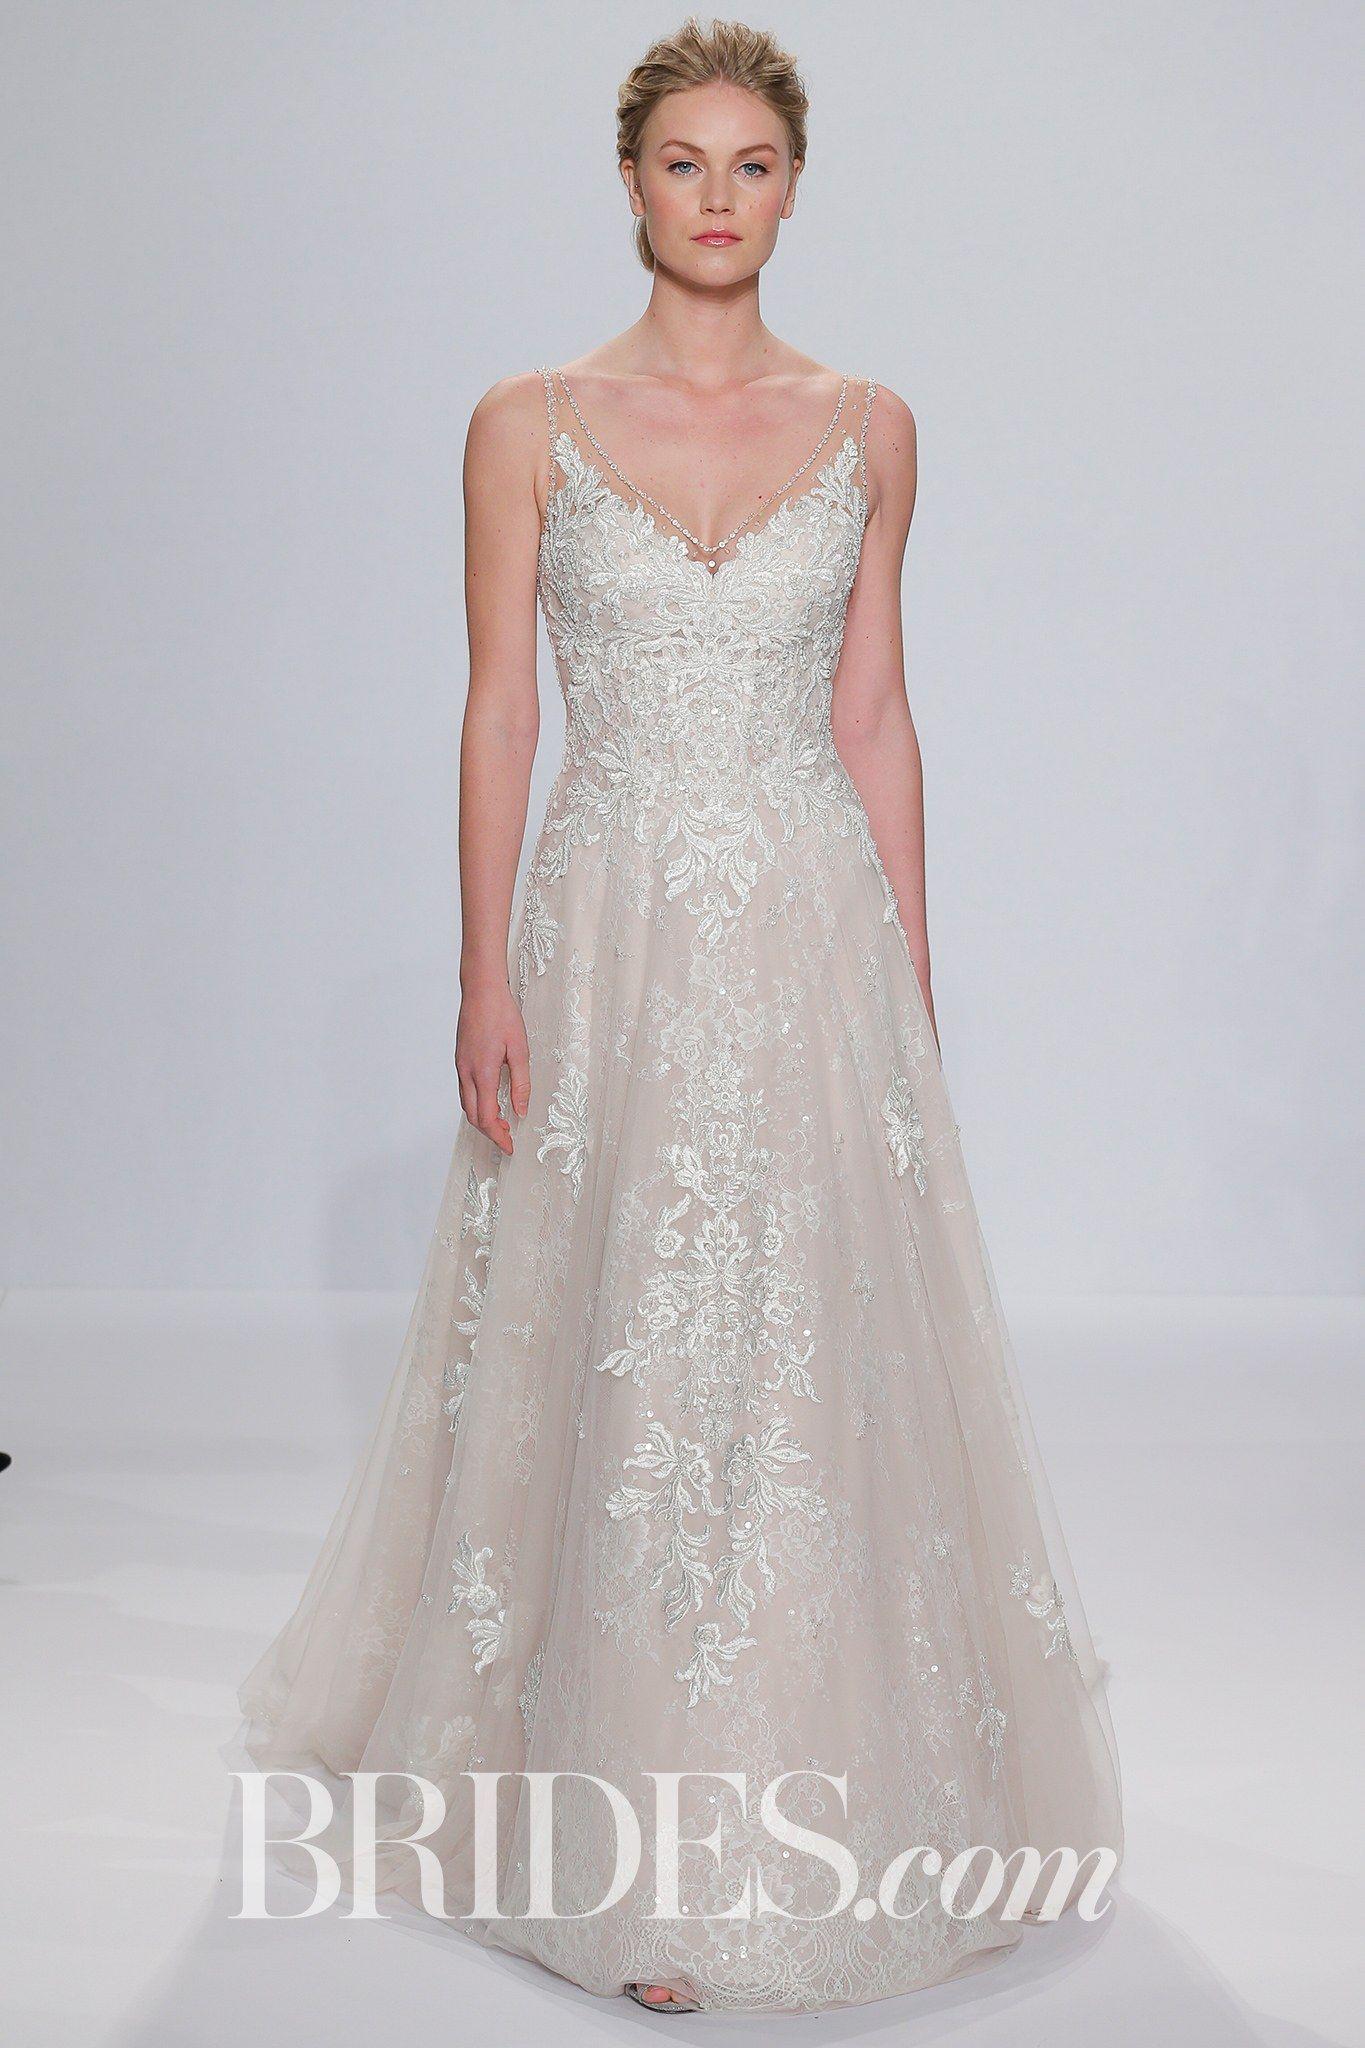 randy fenoli for kleinfeld bridal & wedding dress collection spring